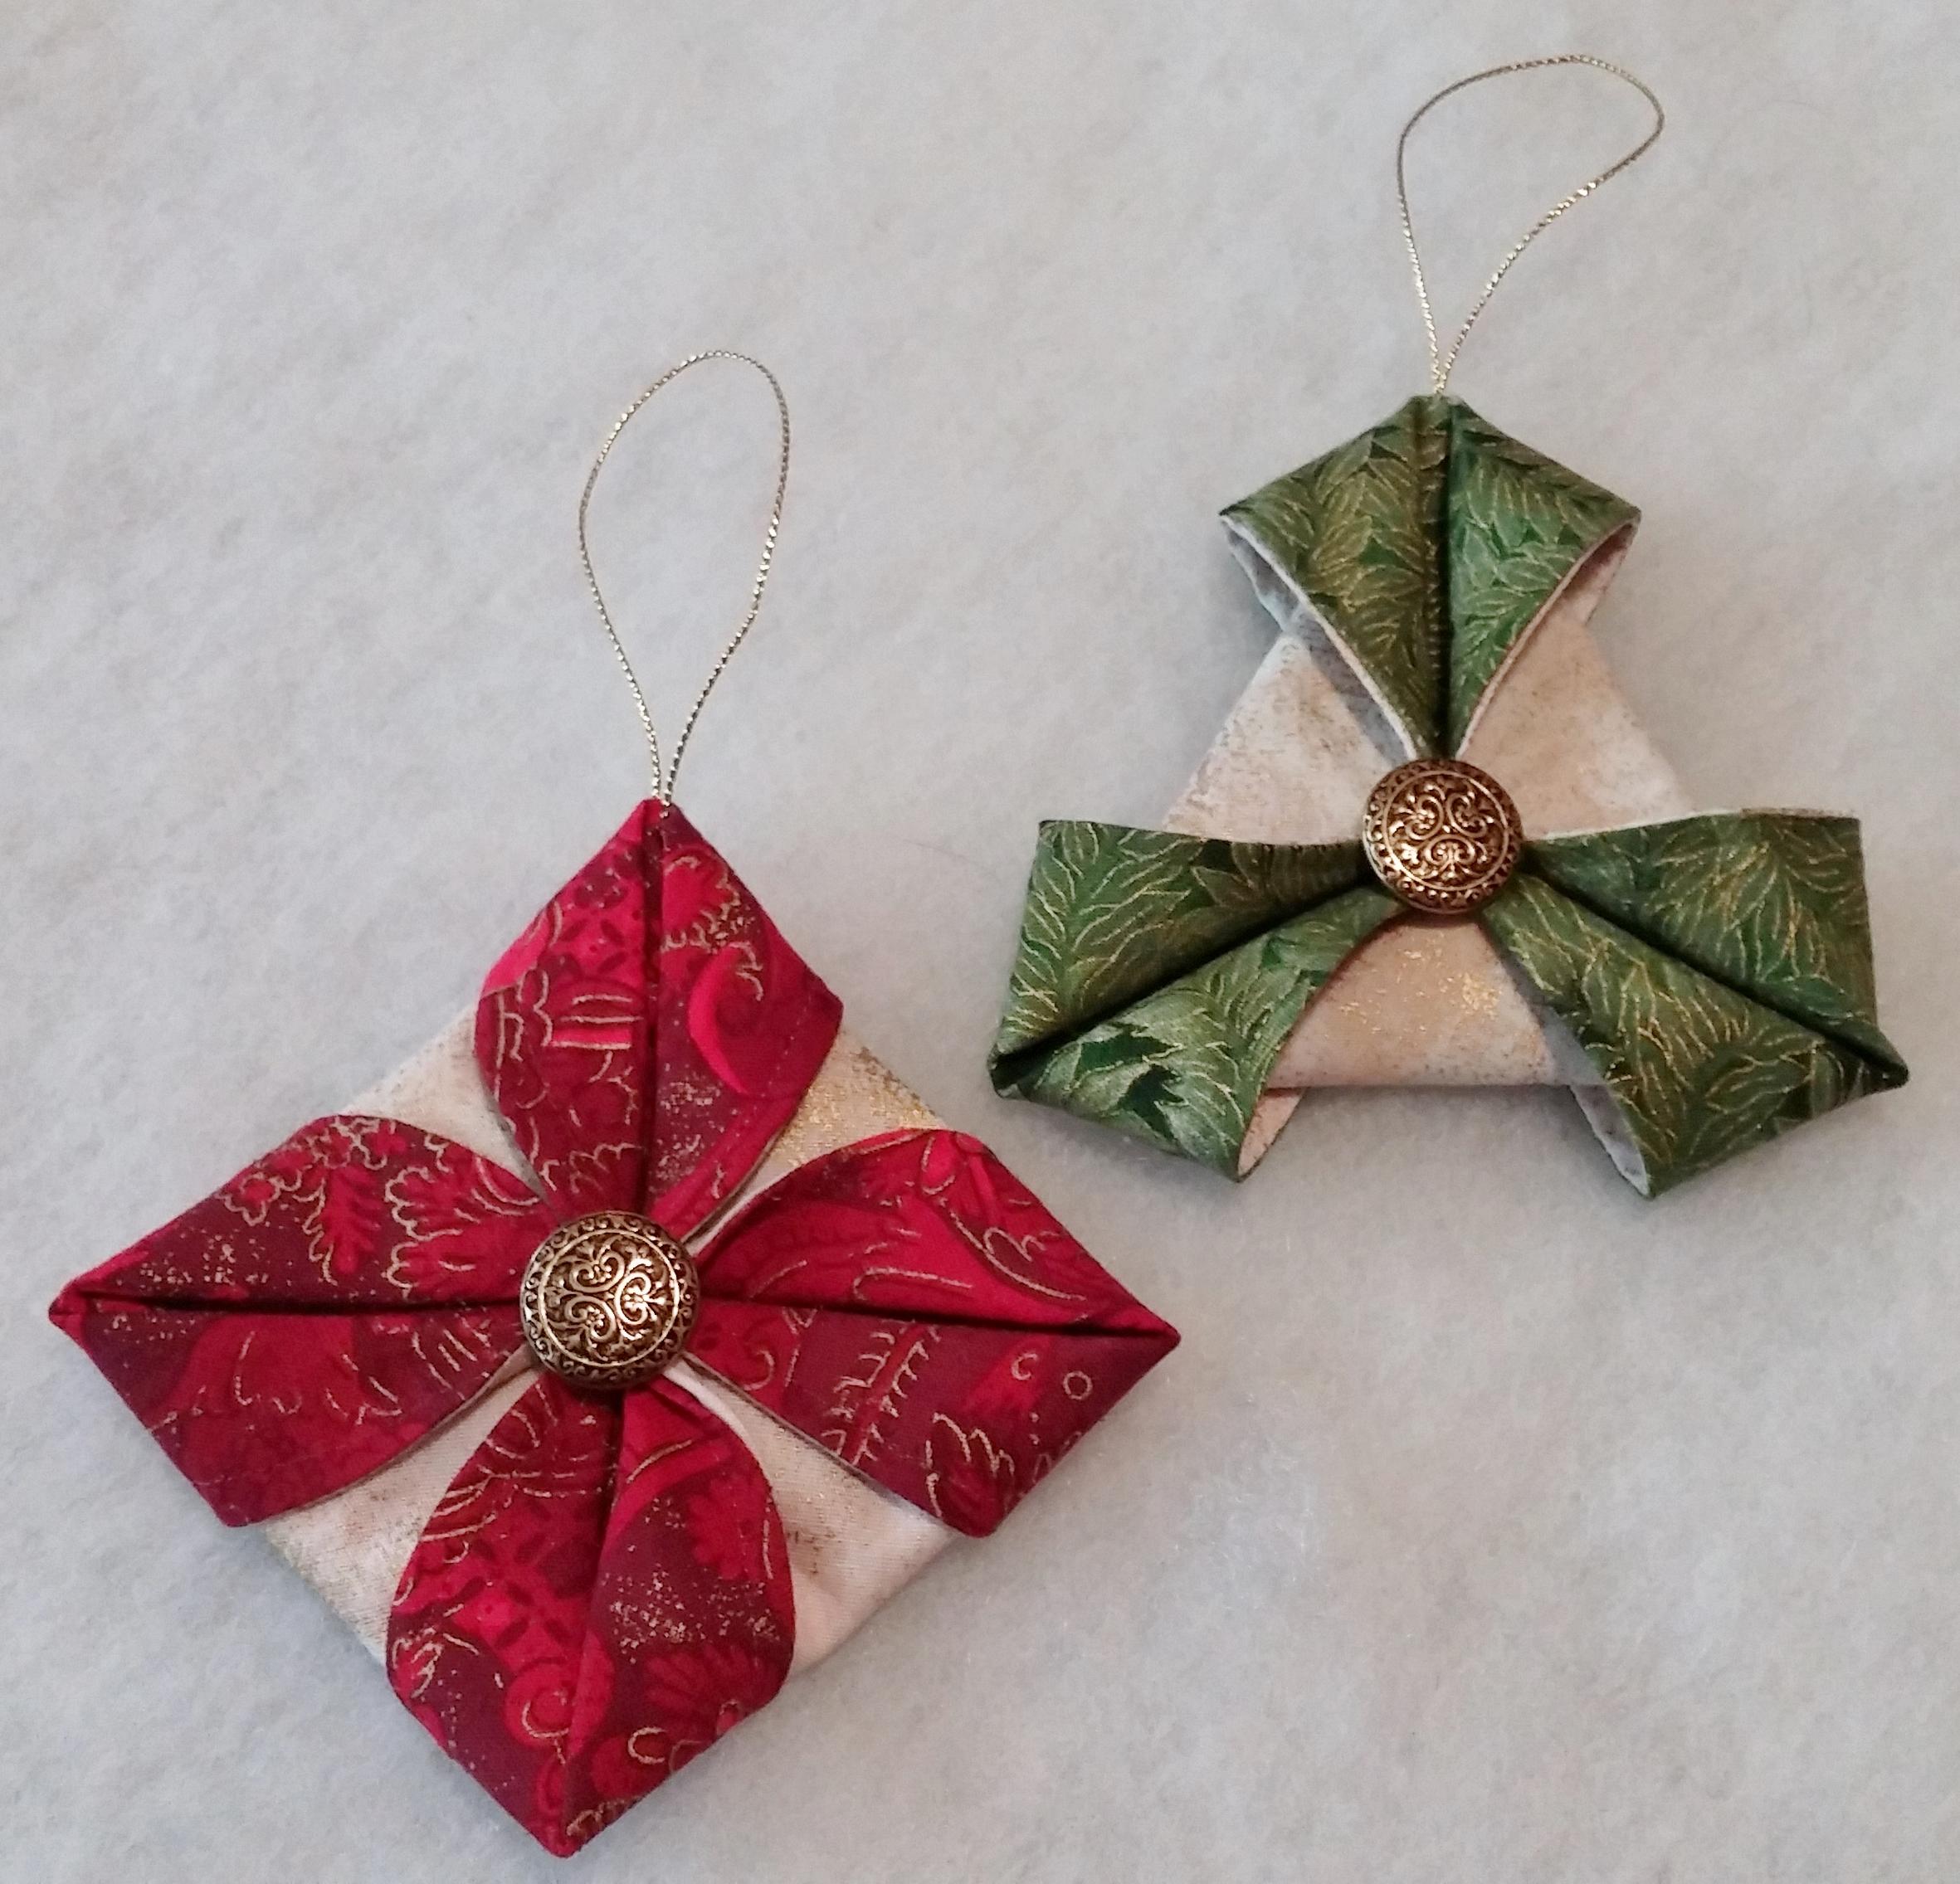 Folded Fabric Ornaments To Sew Tutorial Part 2 Beth Ann Williams